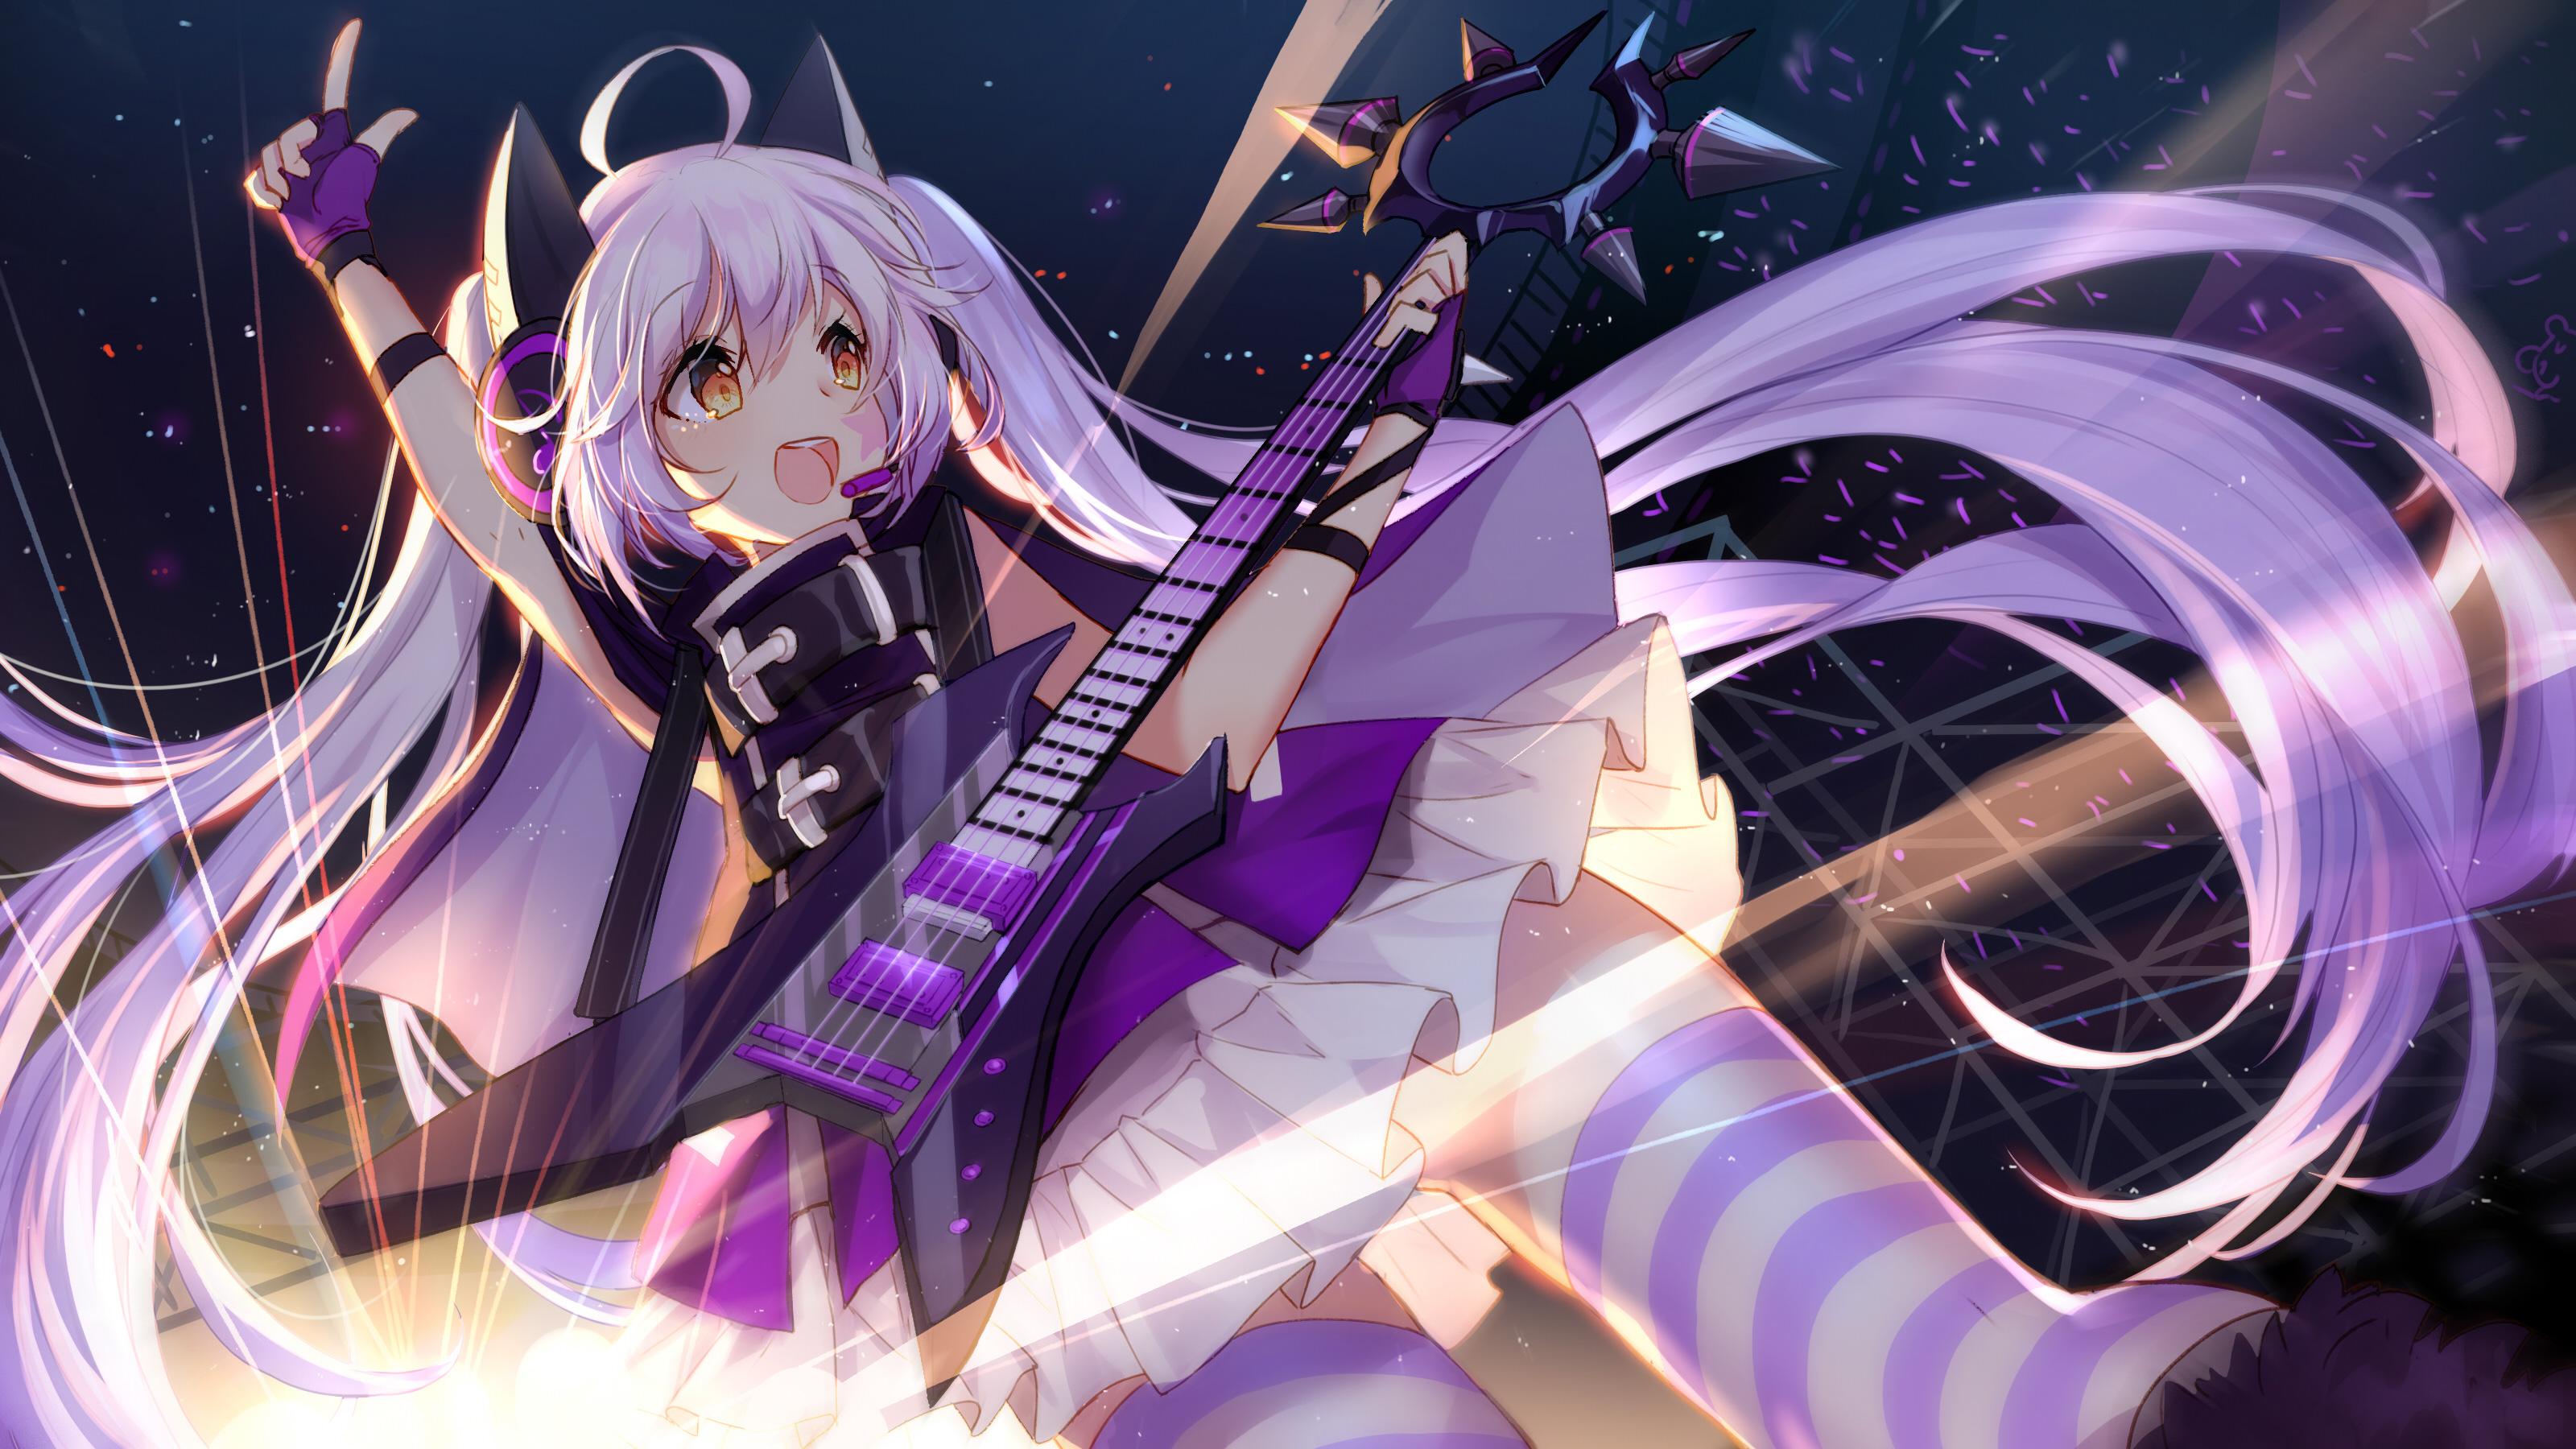 Anime Girl Concert 4k, HD Anime, 4k Wallpapers, Images ...